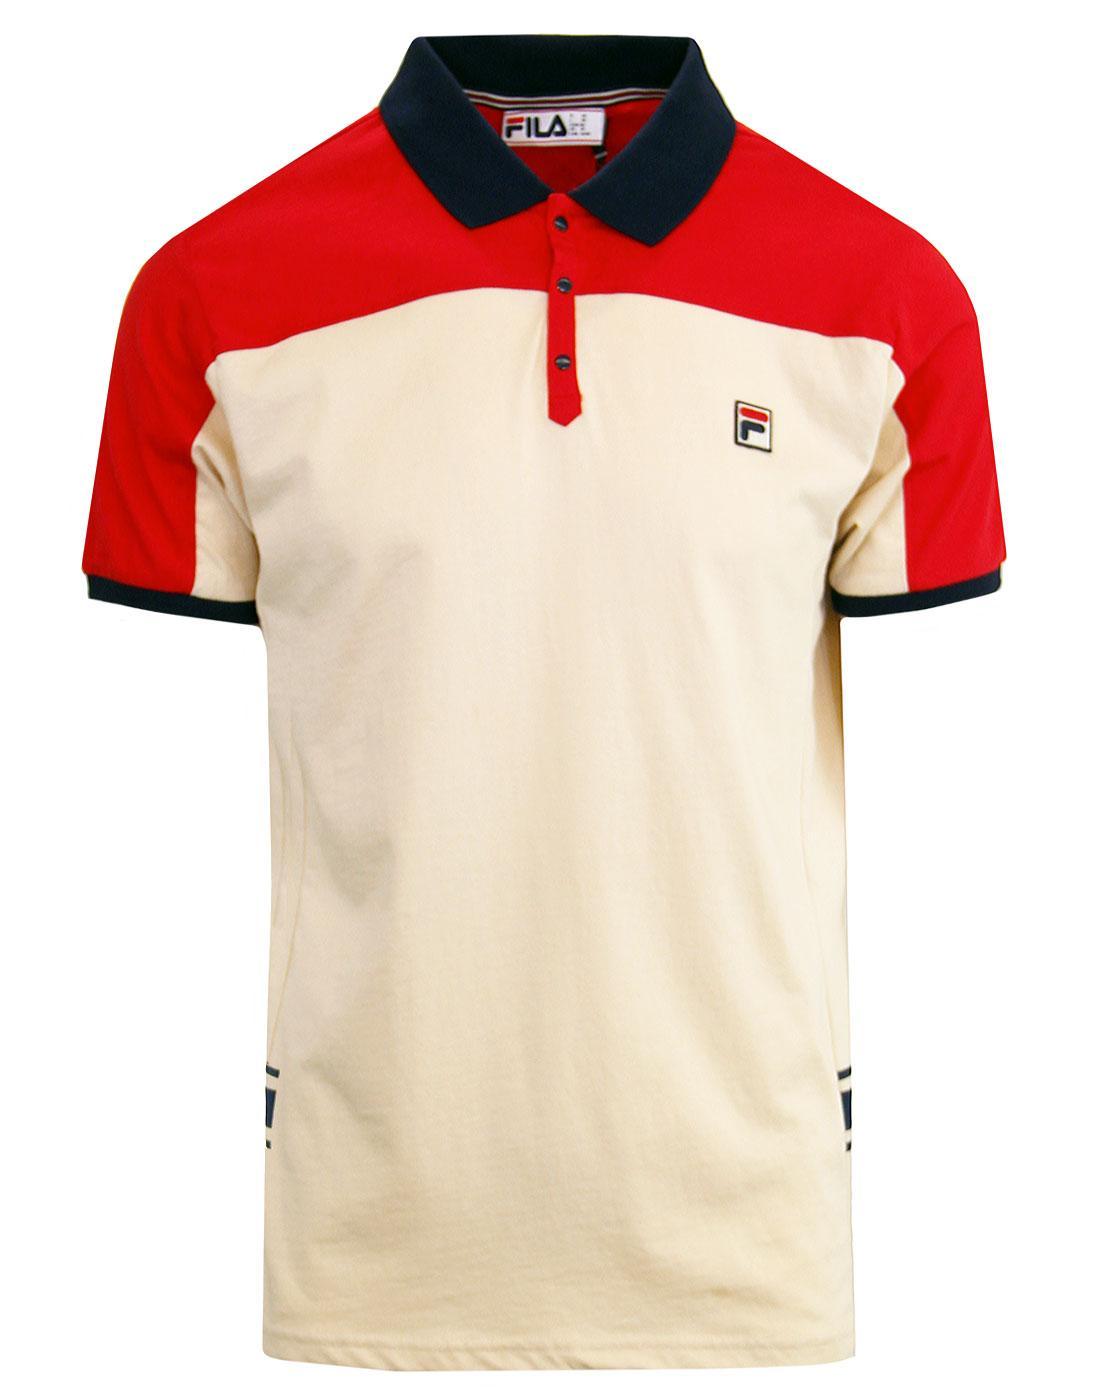 Mivvi FILA VINTAGE Mens Retro 80s Tennis Polo RED